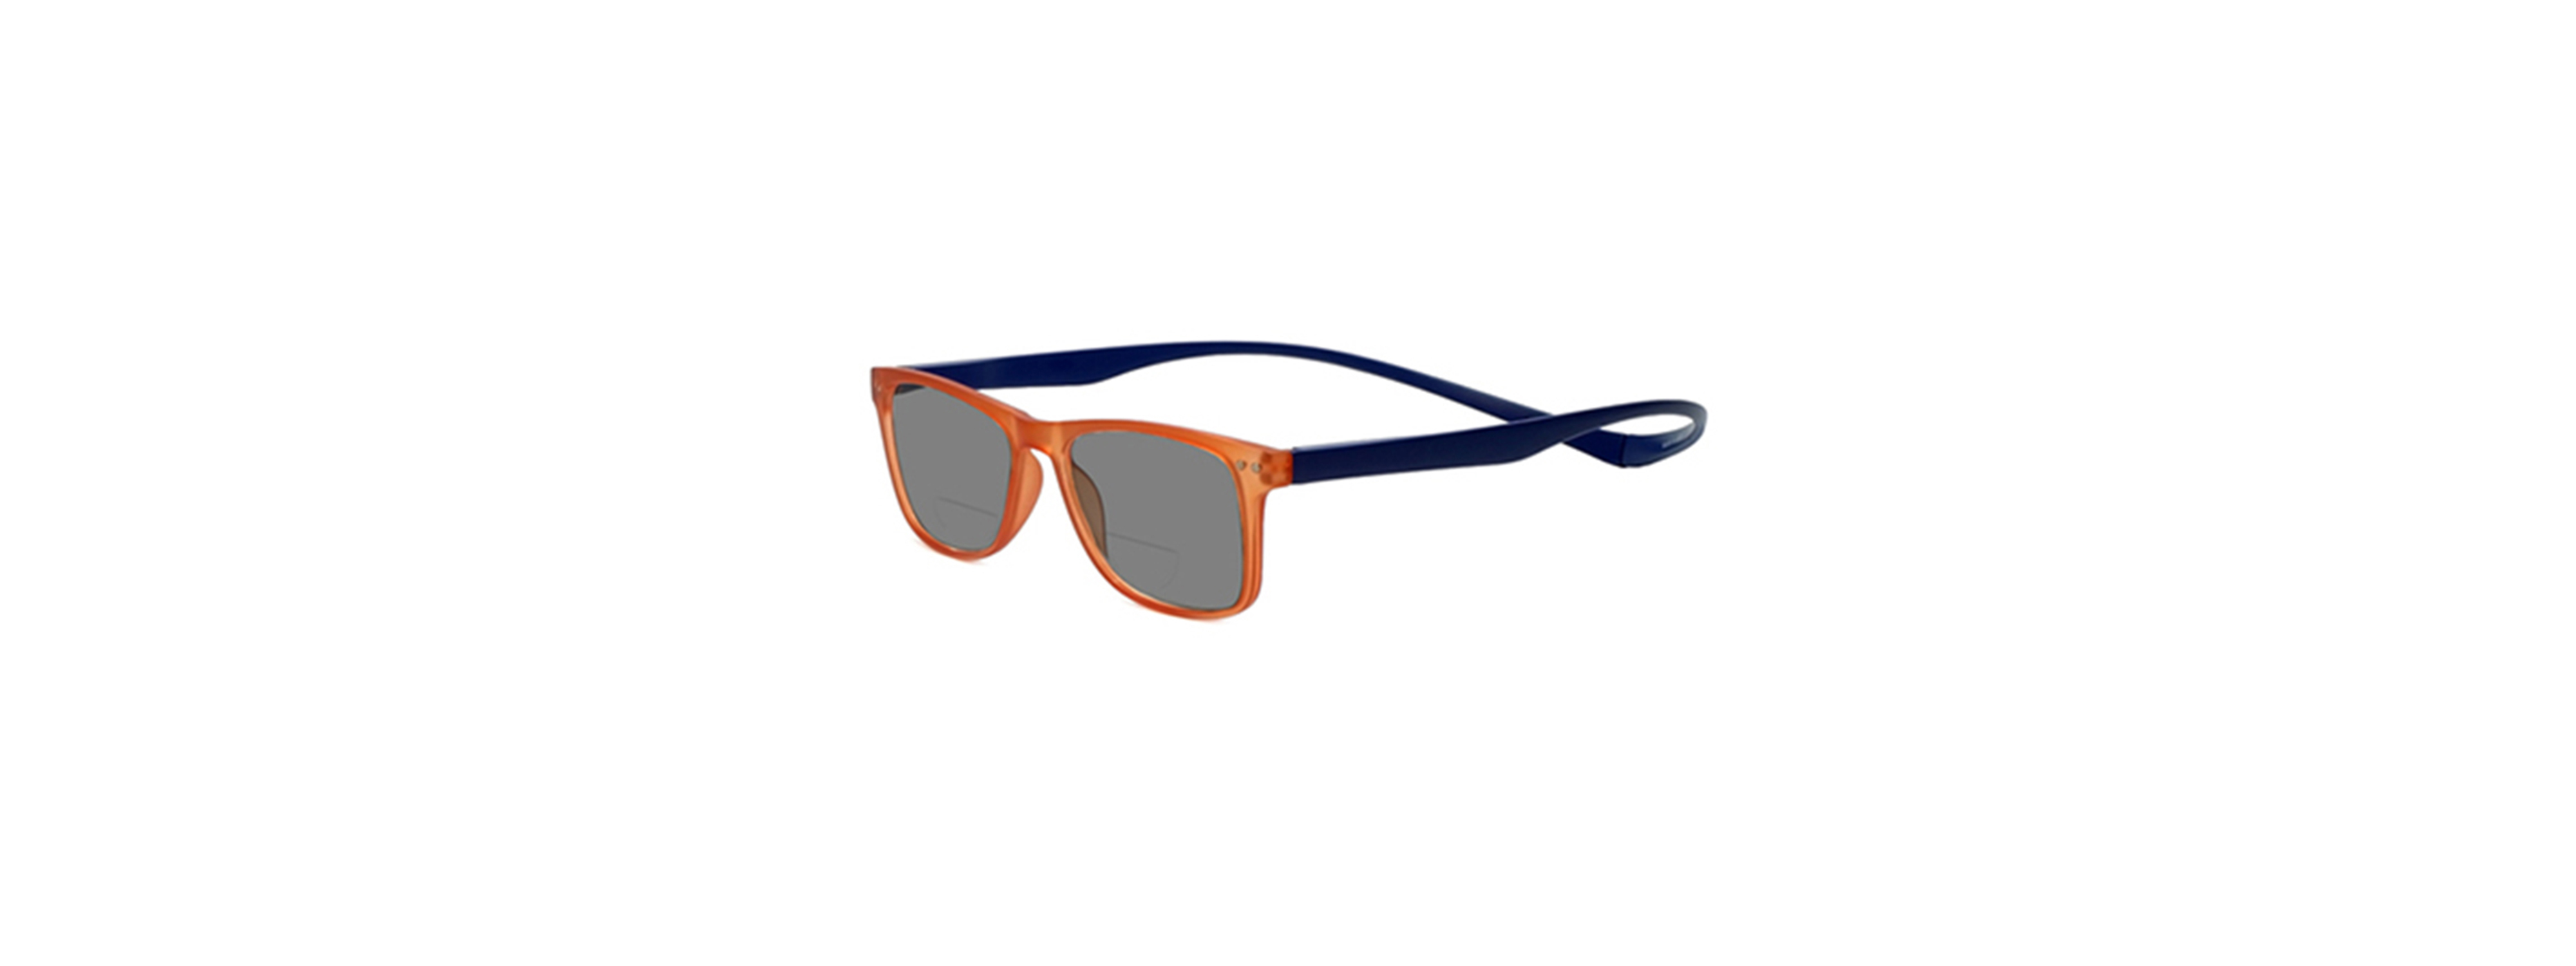 Bi-Focal Sunglasses